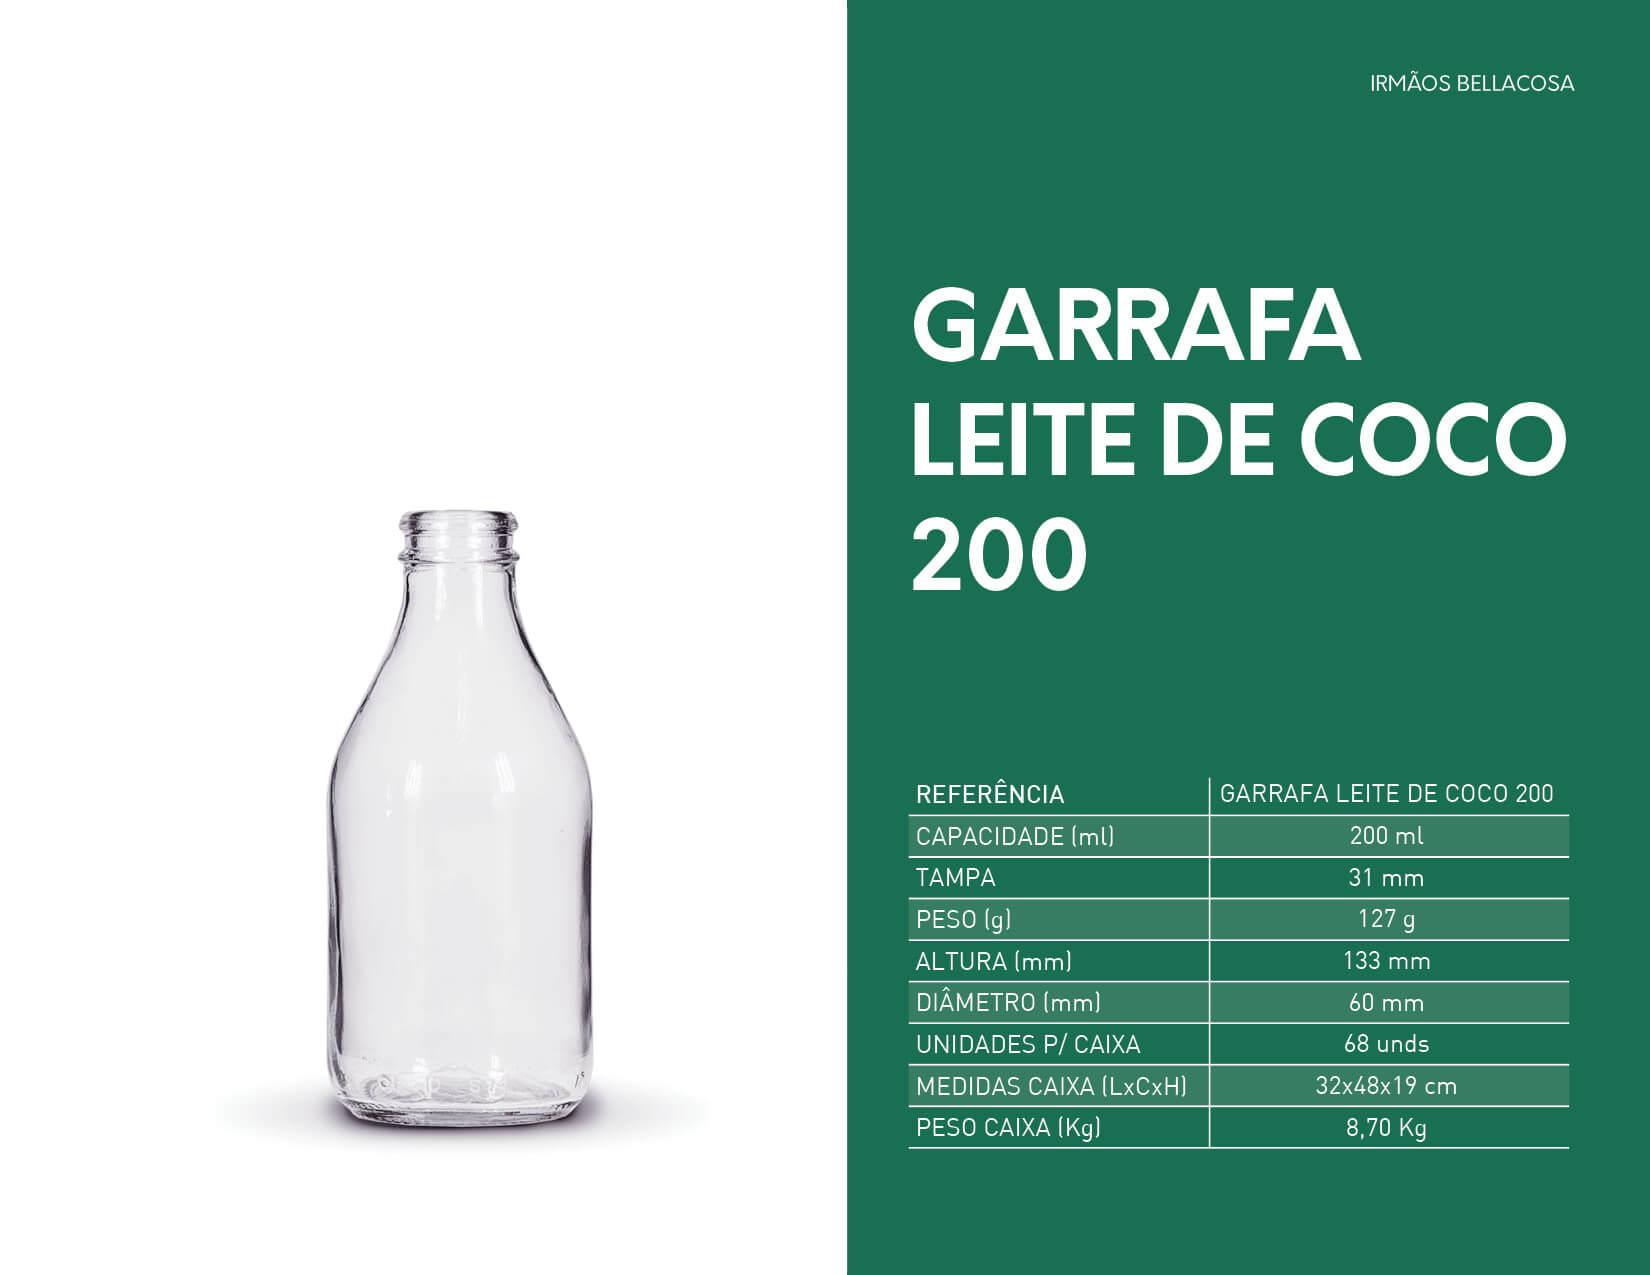 041-Garrafa-leite-de-coco-200-irmaos-bellacosa-embalagens-de-vidro